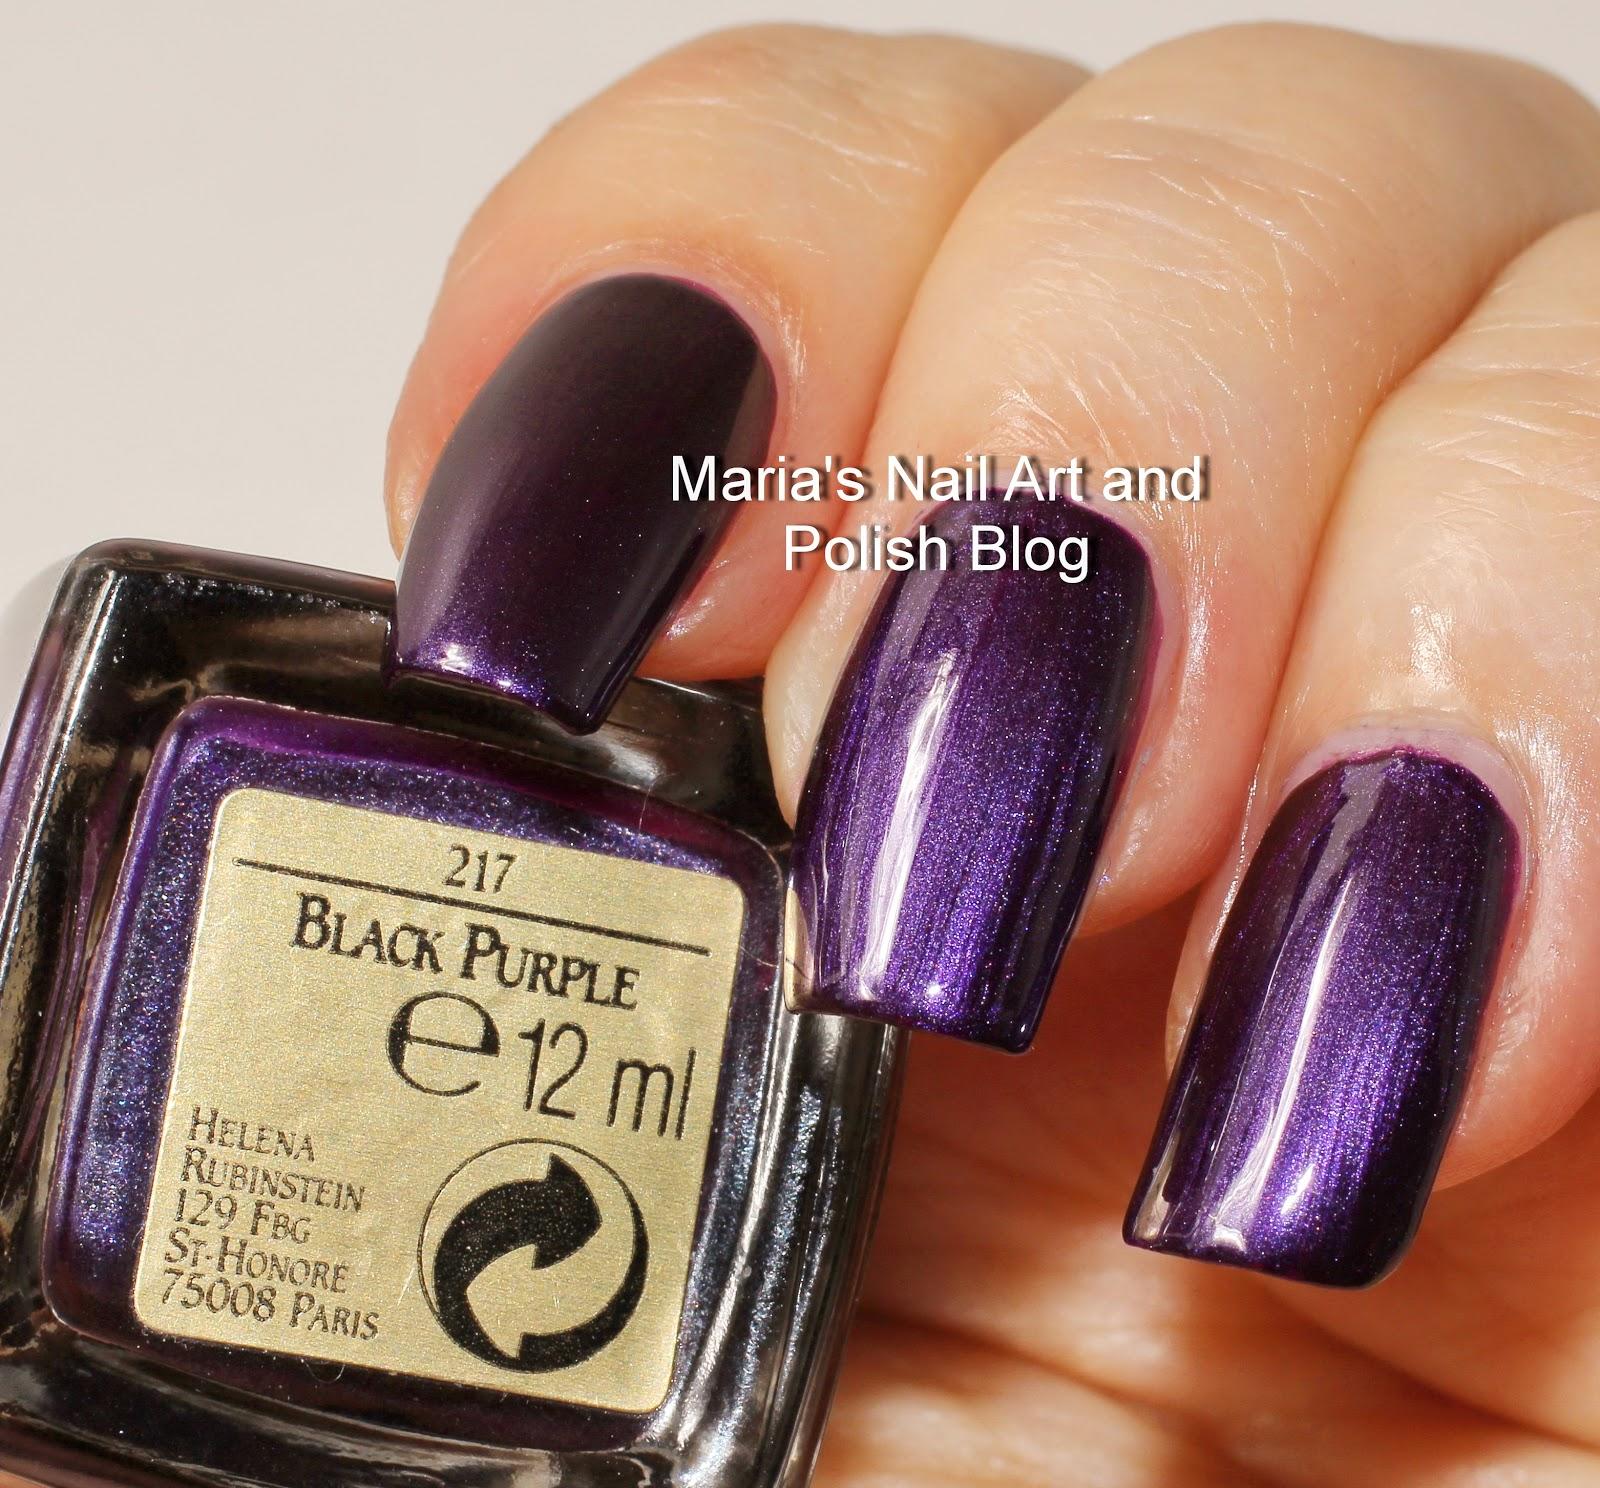 Marias Nail Art And Polish Blog: Helena Rubinstein Black